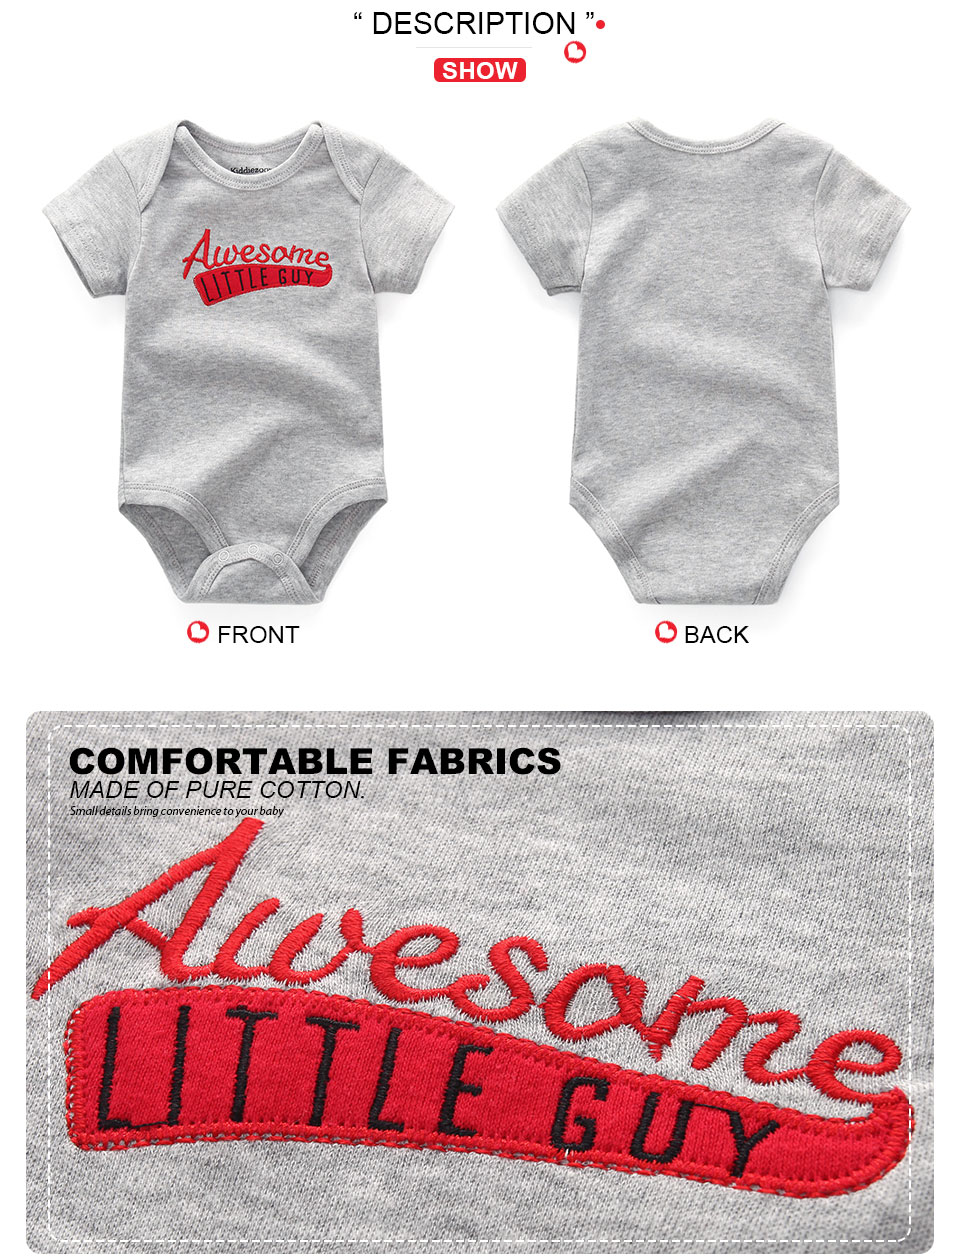 HTB1gaCOKeOSBuNjy0Fdq6zDnVXan 2019 6PCS/Lot Unisex Unicorn Baby Boy Clothes Cotton Kids Clothes Newborn Rompers 0-12M Baby Girl Clothes Roupa de bebe